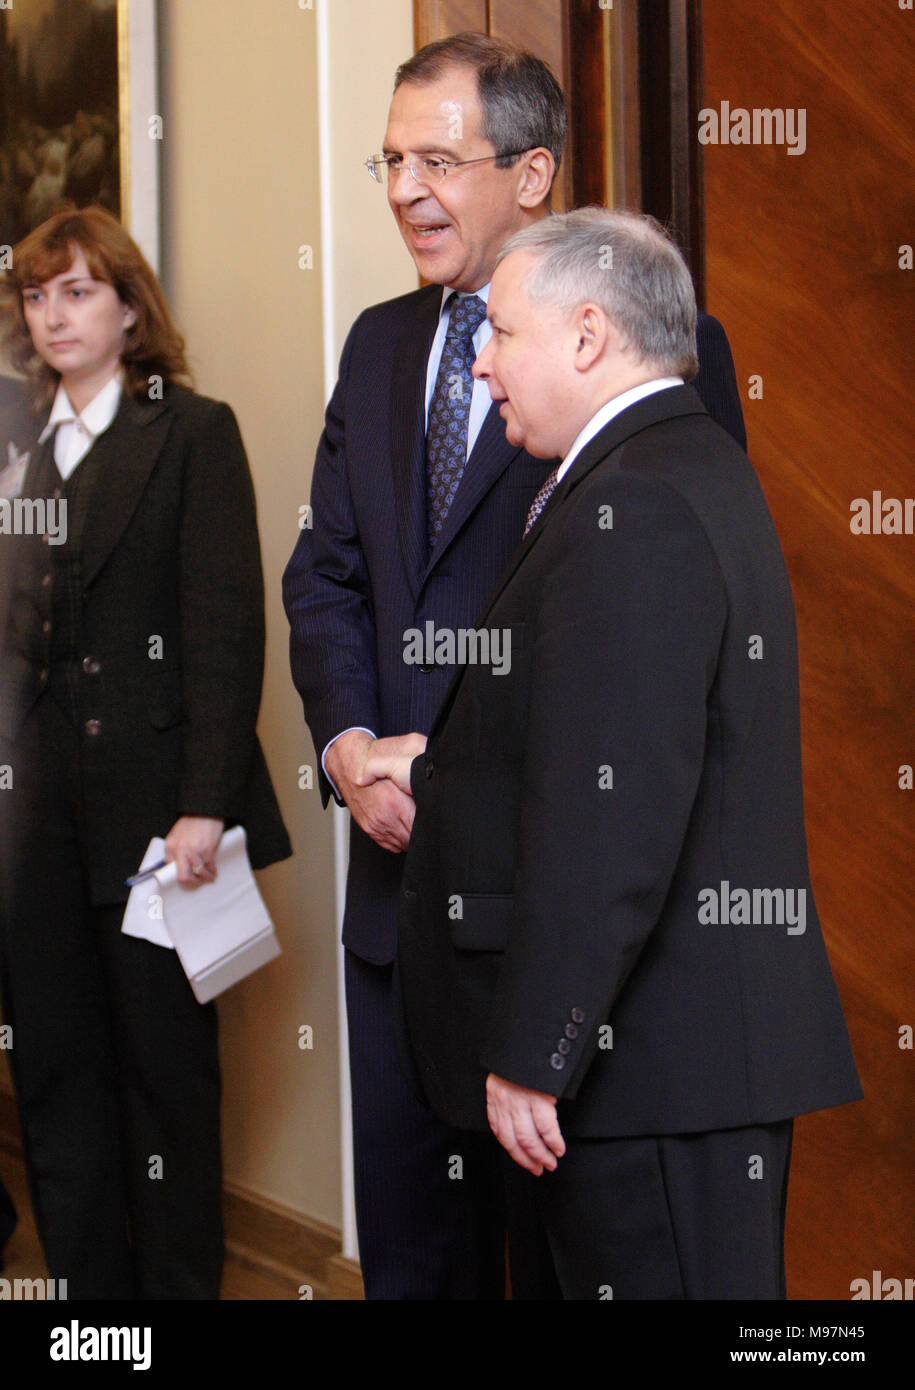 Warsaw, Masovia / Poland - 2006/10/05: Sergey Lavrov - Foreign Affairs Minister of Russian Federation with Jaroslaw Kaczynski - Prime Minister Ministe - Stock Image